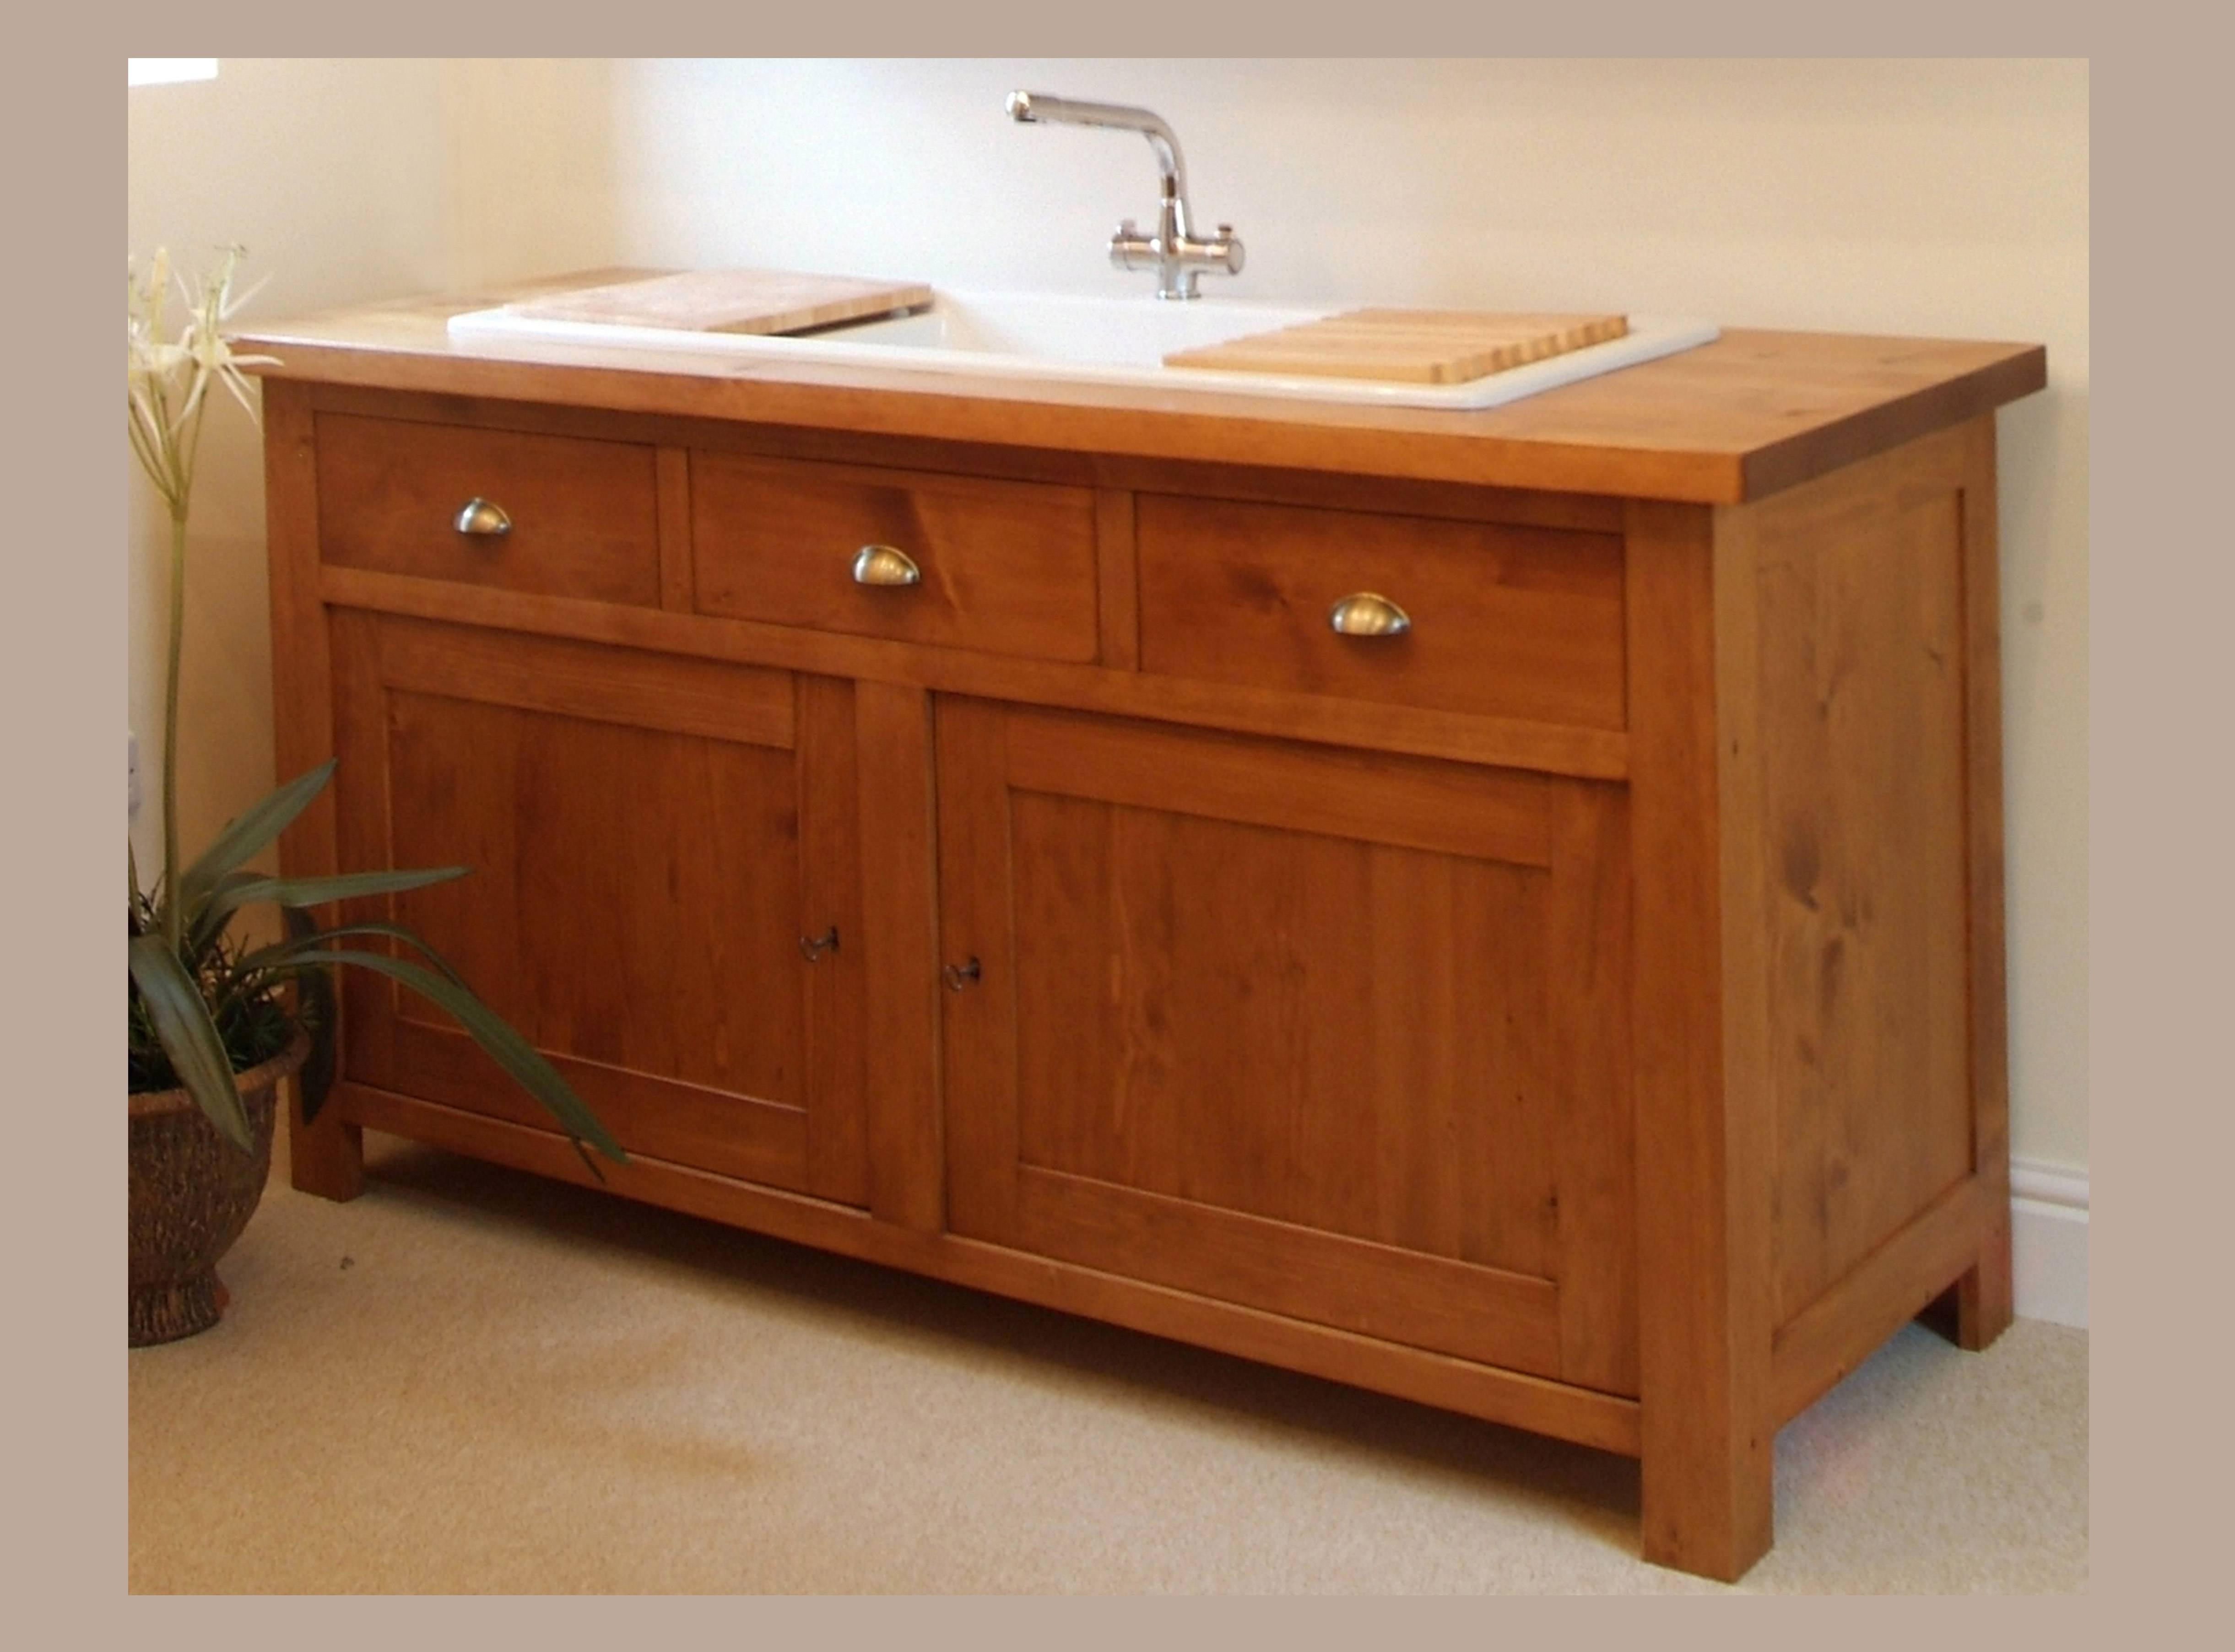 Shaker Style Freestanding Inset Sink Unit – Kuchyne Bohemian (View 14 of 20)